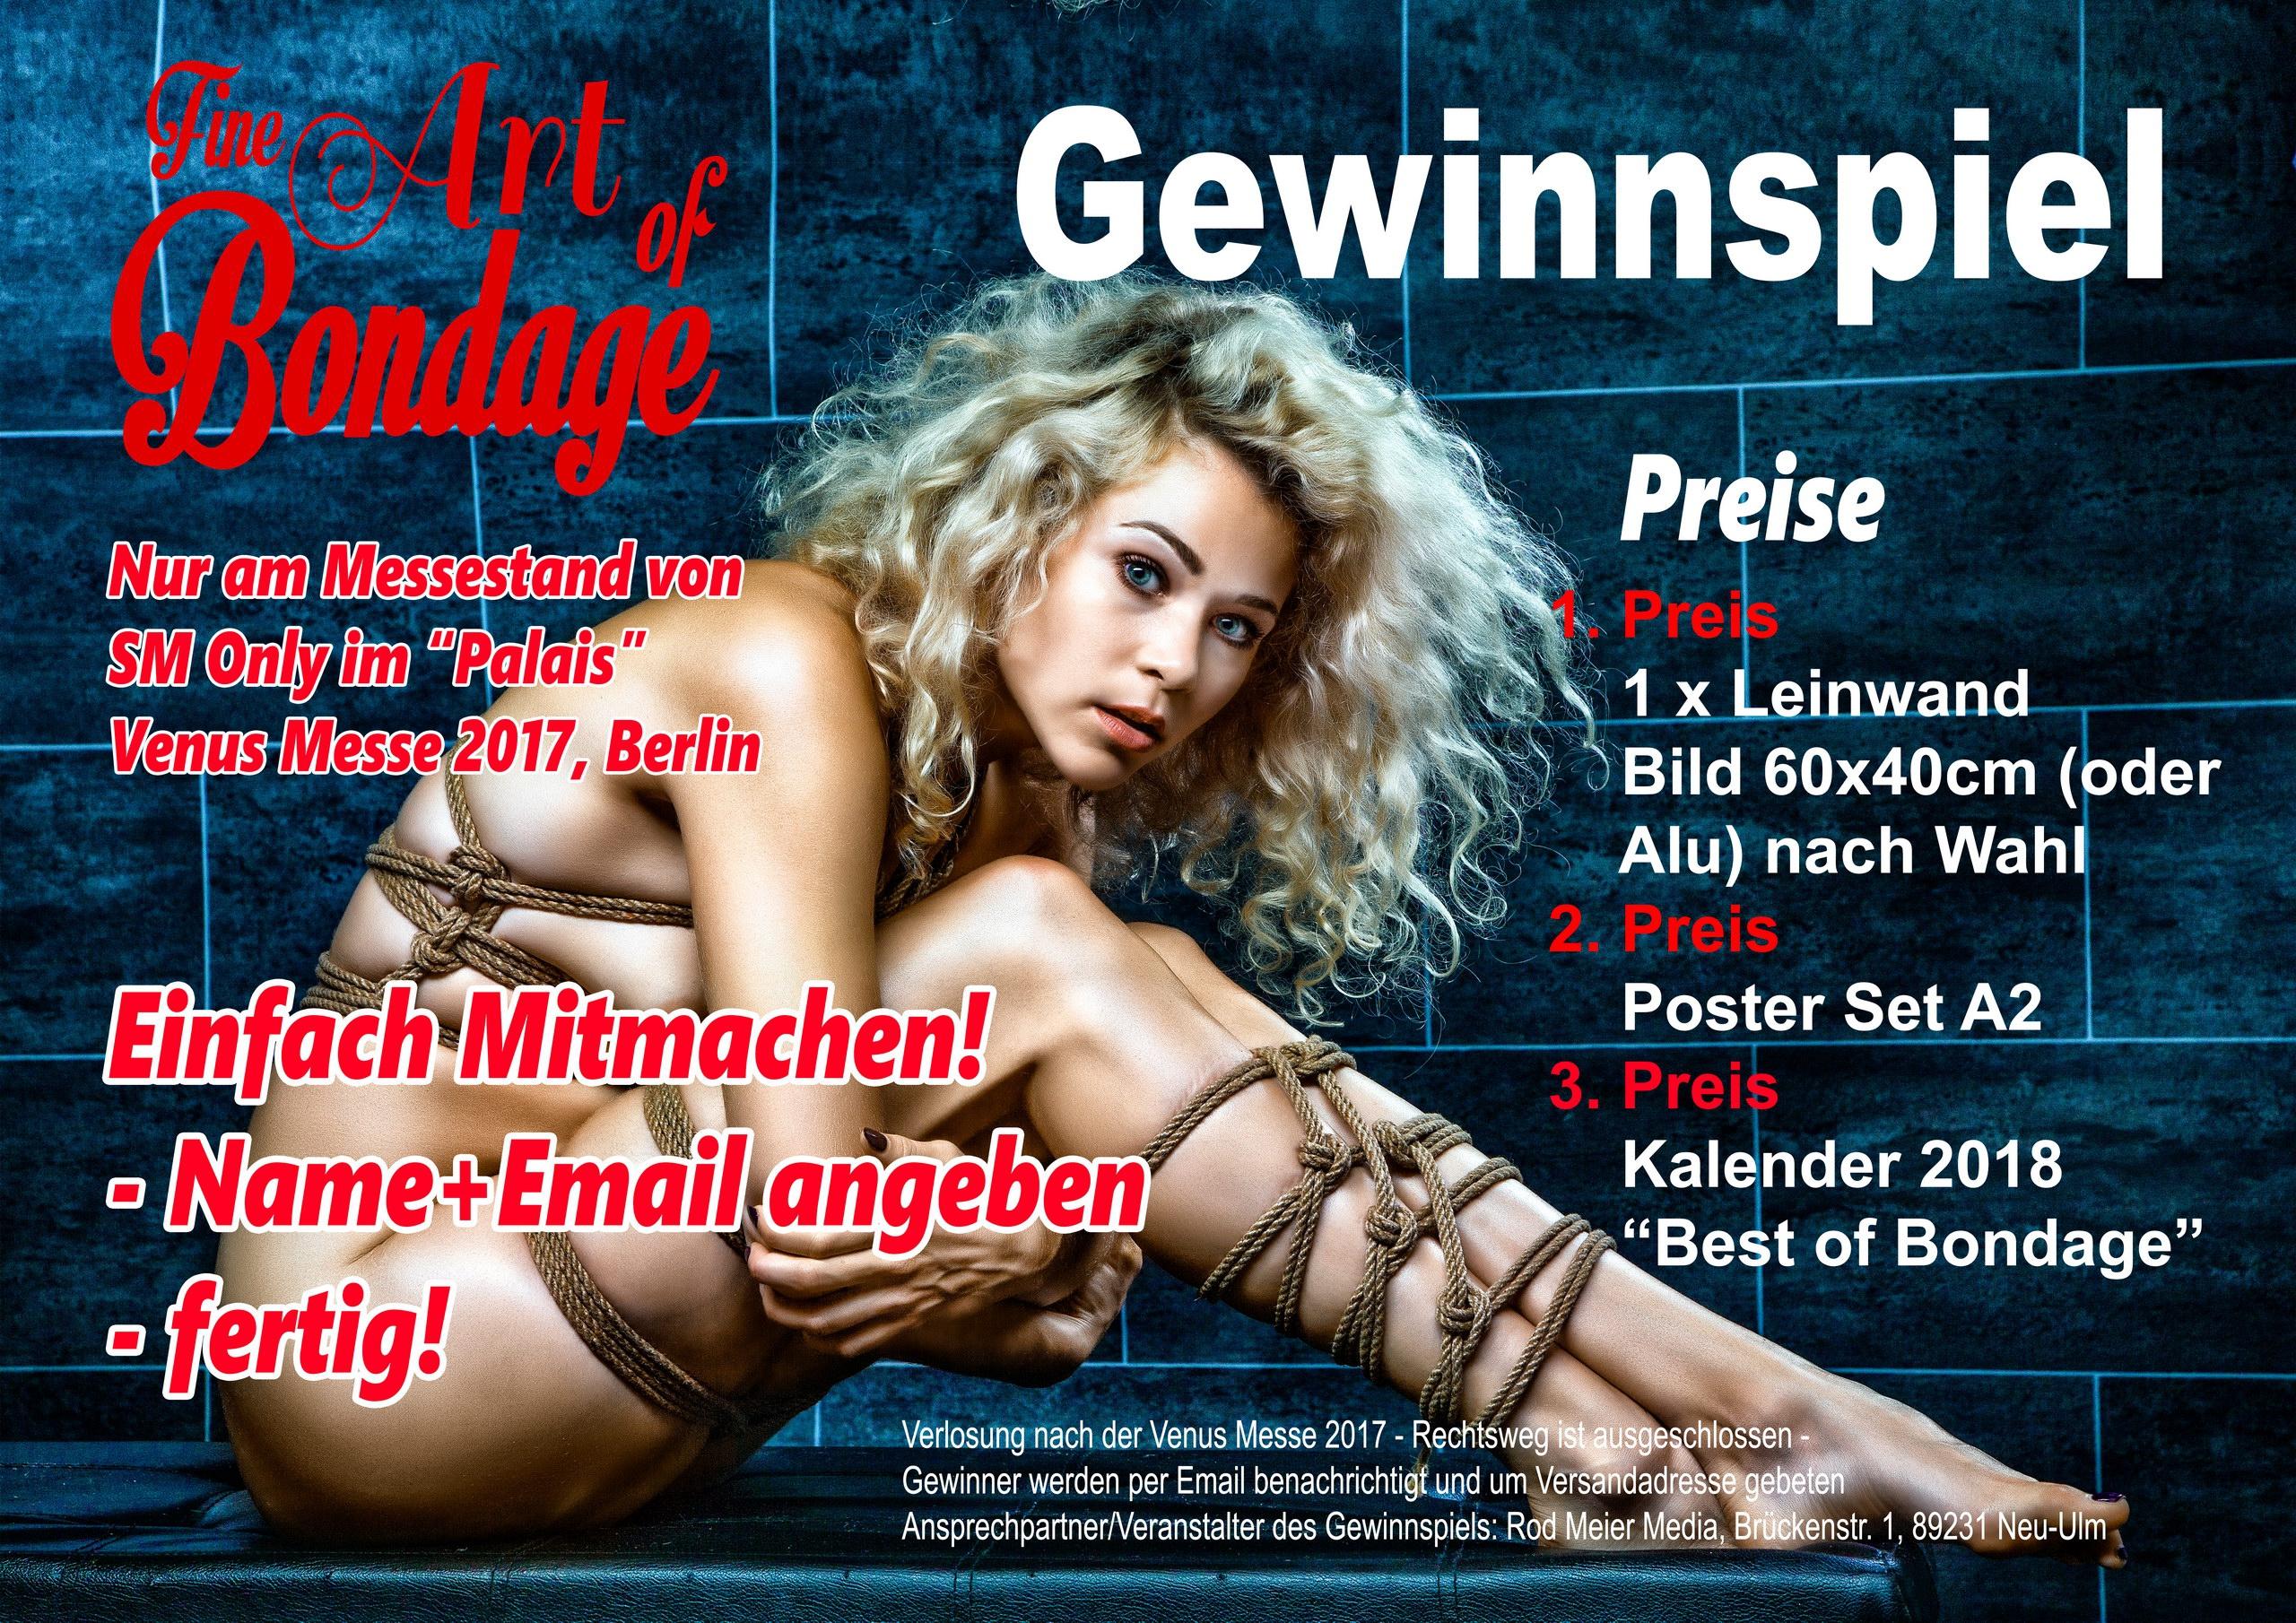 Gewinnspiel - Fine Art of Bondage - Venus Messe Berlin